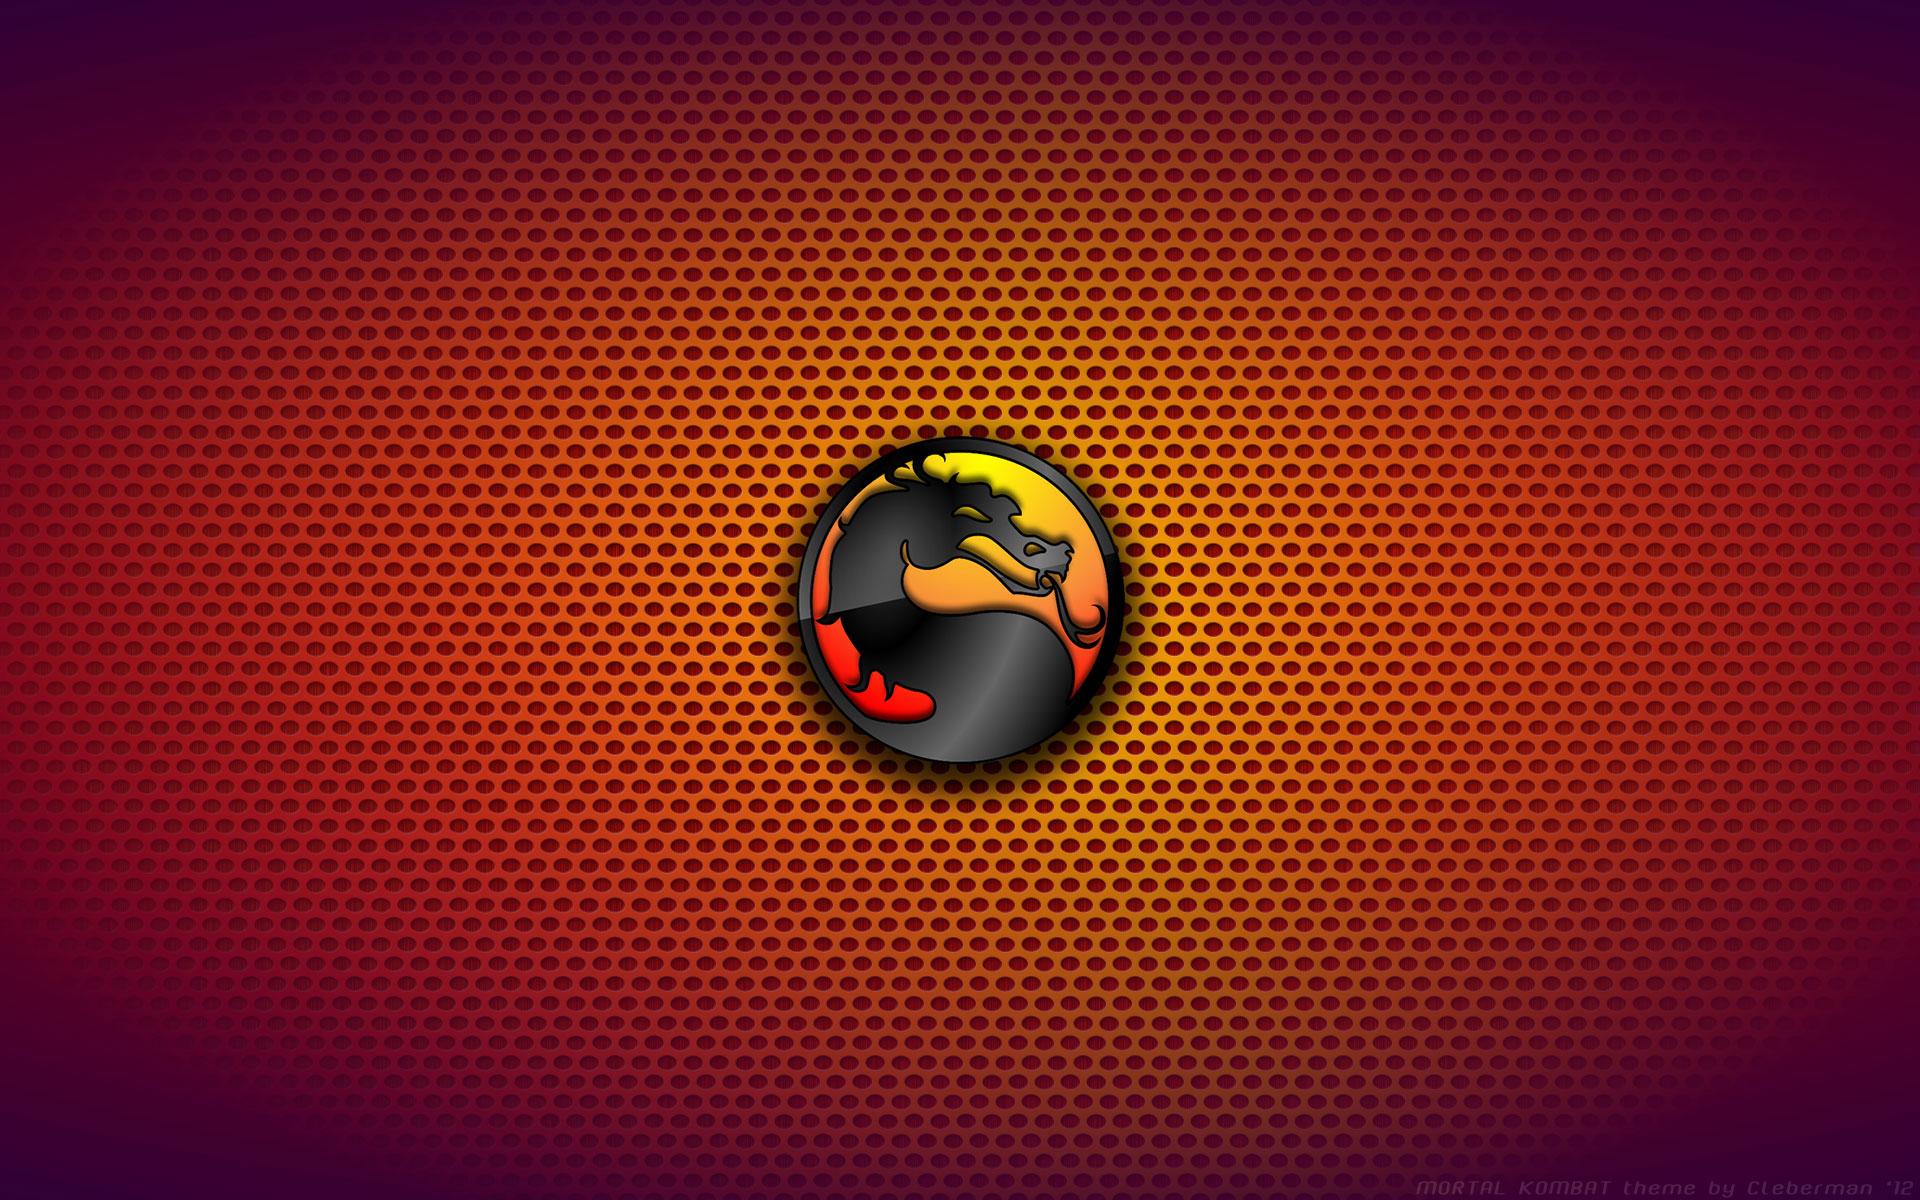 Mortal Kombat Wallpaper Windows 78 7624 Wallpaper Cool 1920x1200